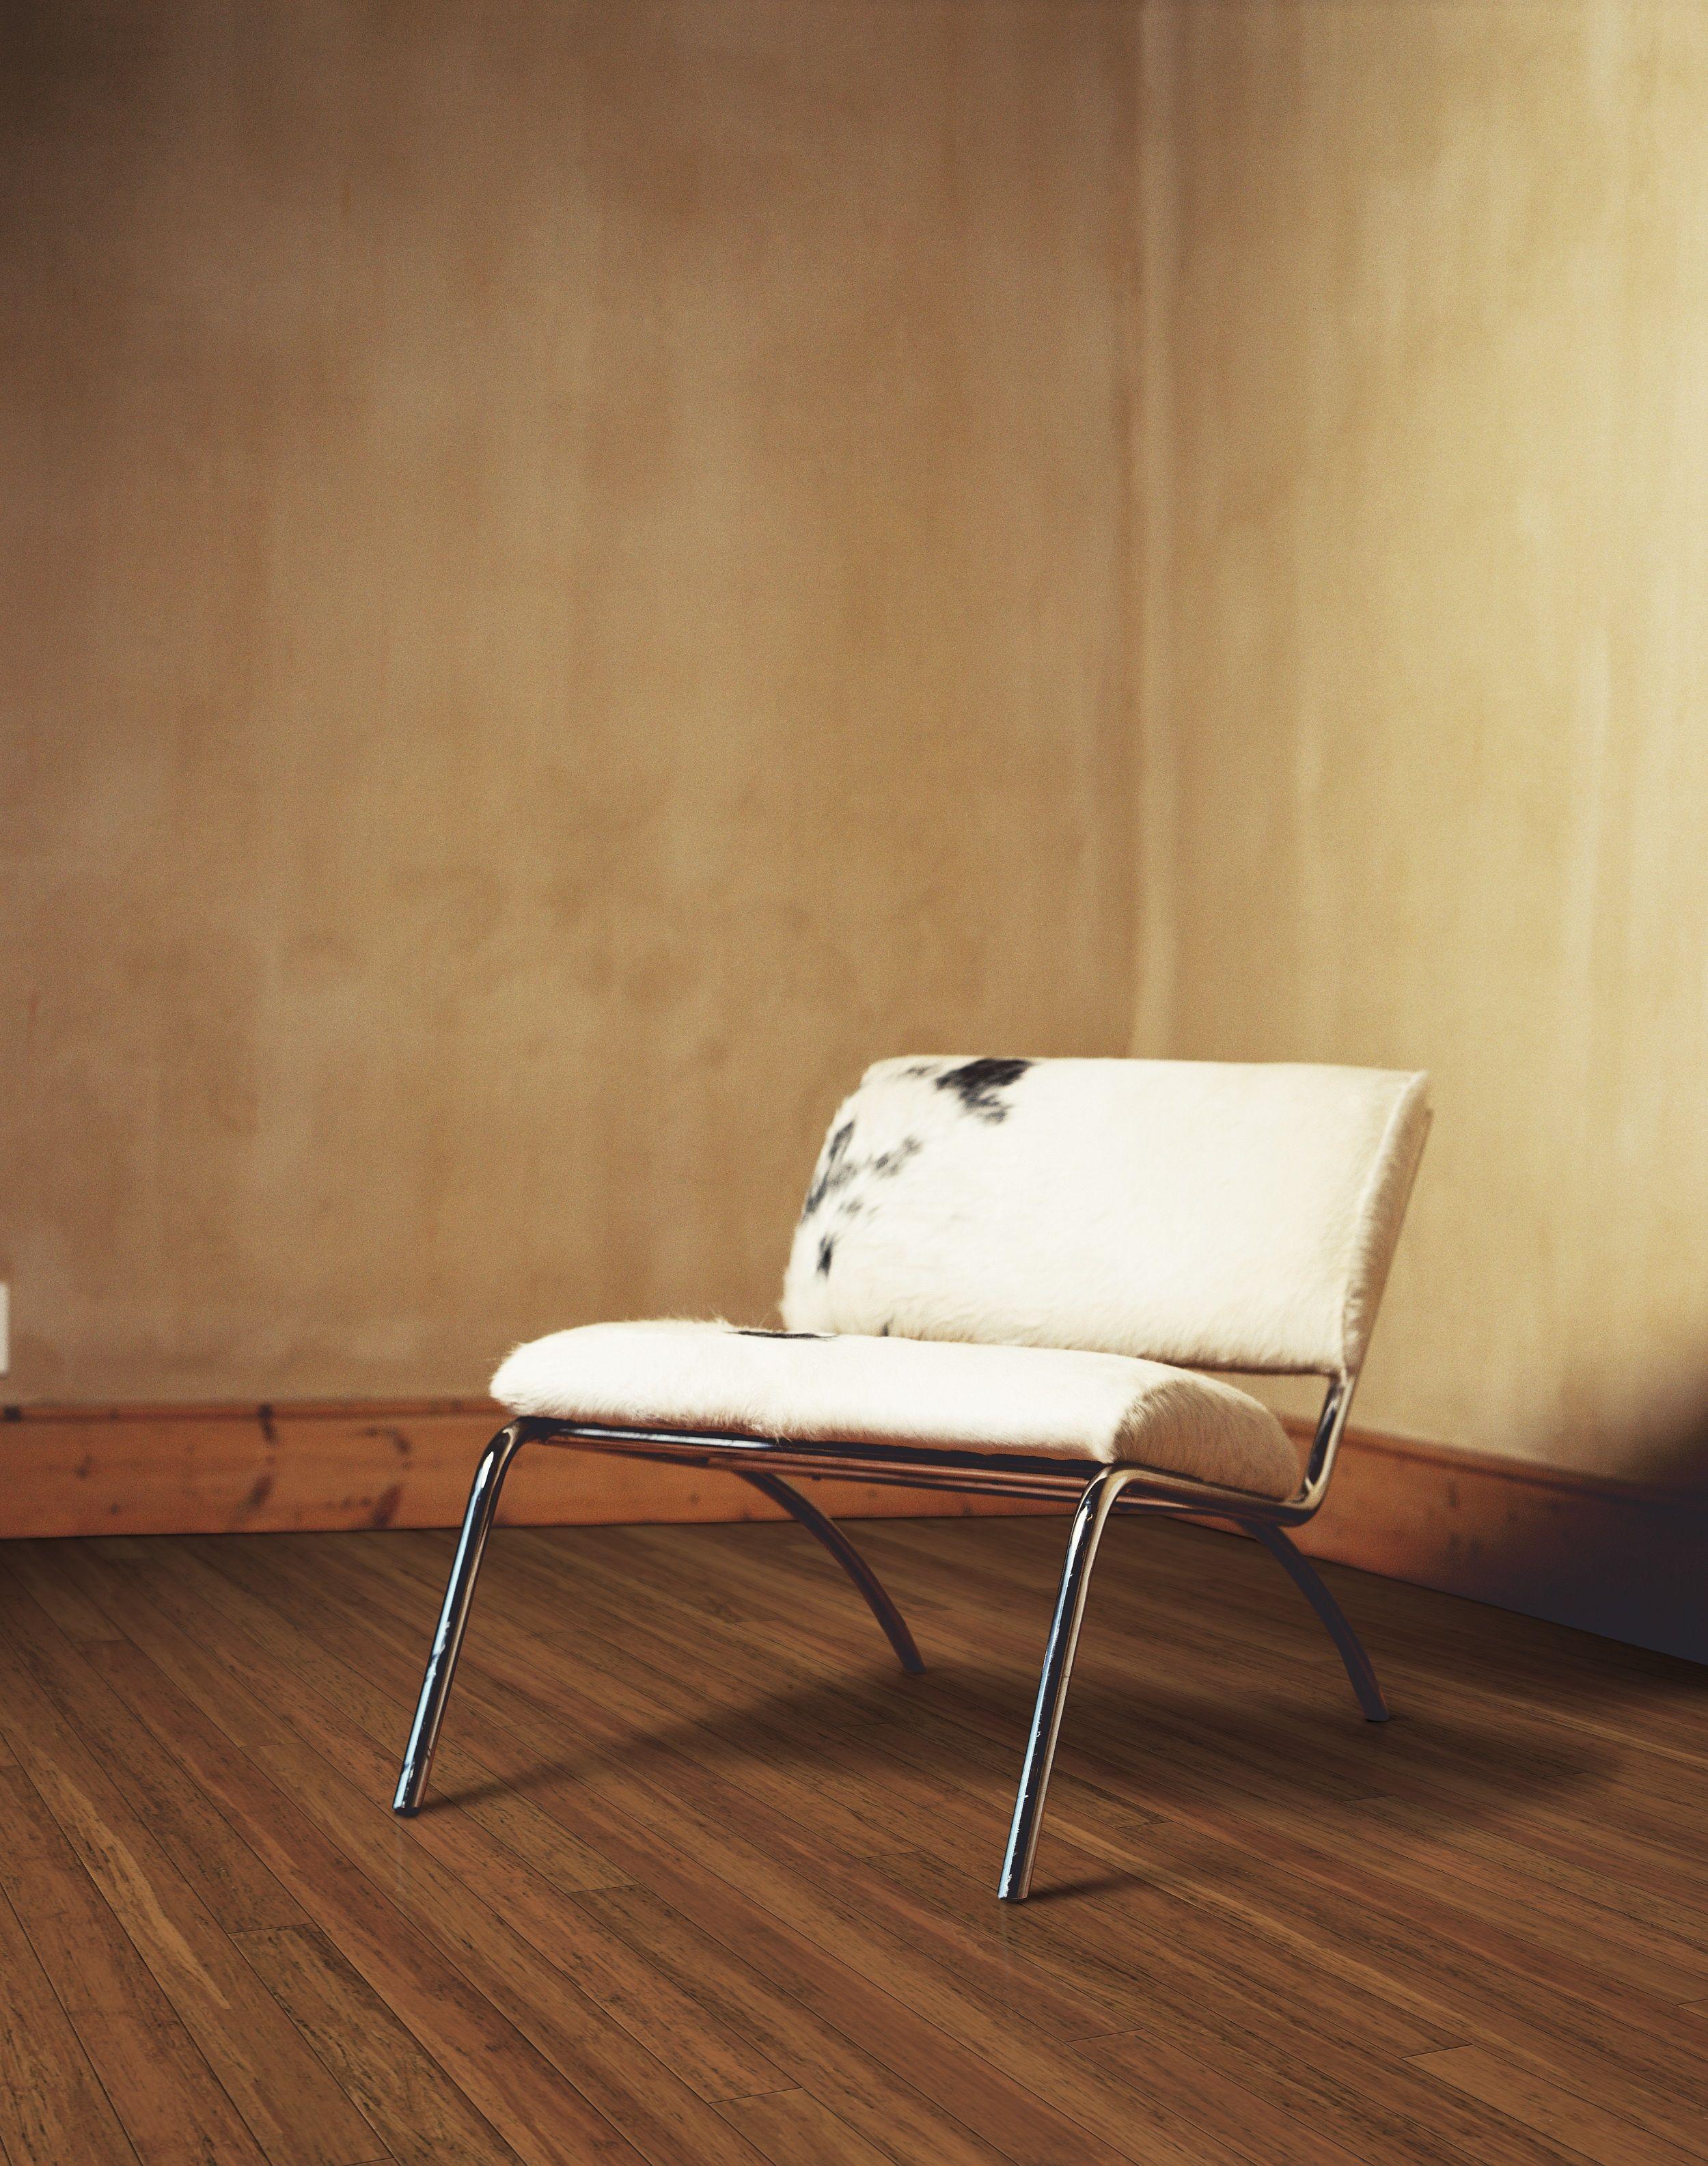 Natural Bamboo Hardwood Floors Muse Strand Bamboo Floor Muse - Cutting edge wood floors